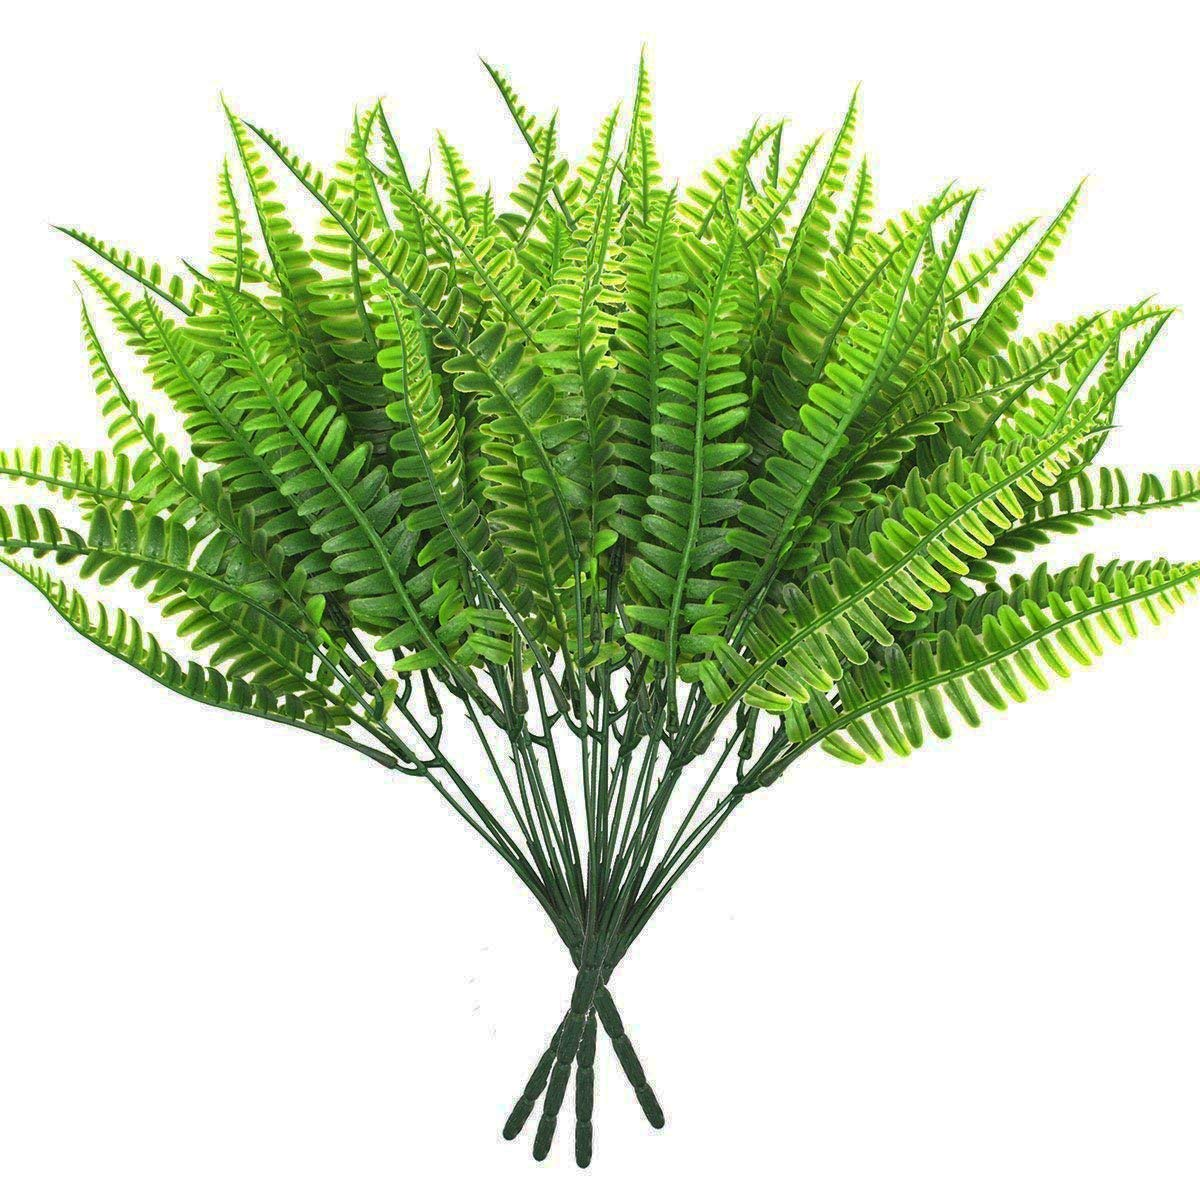 Warmter Artificial Boston Fern Bush Outdoor UV Resistant Plants Shrubs Bushes Greenery for Decor (4 Bunches)